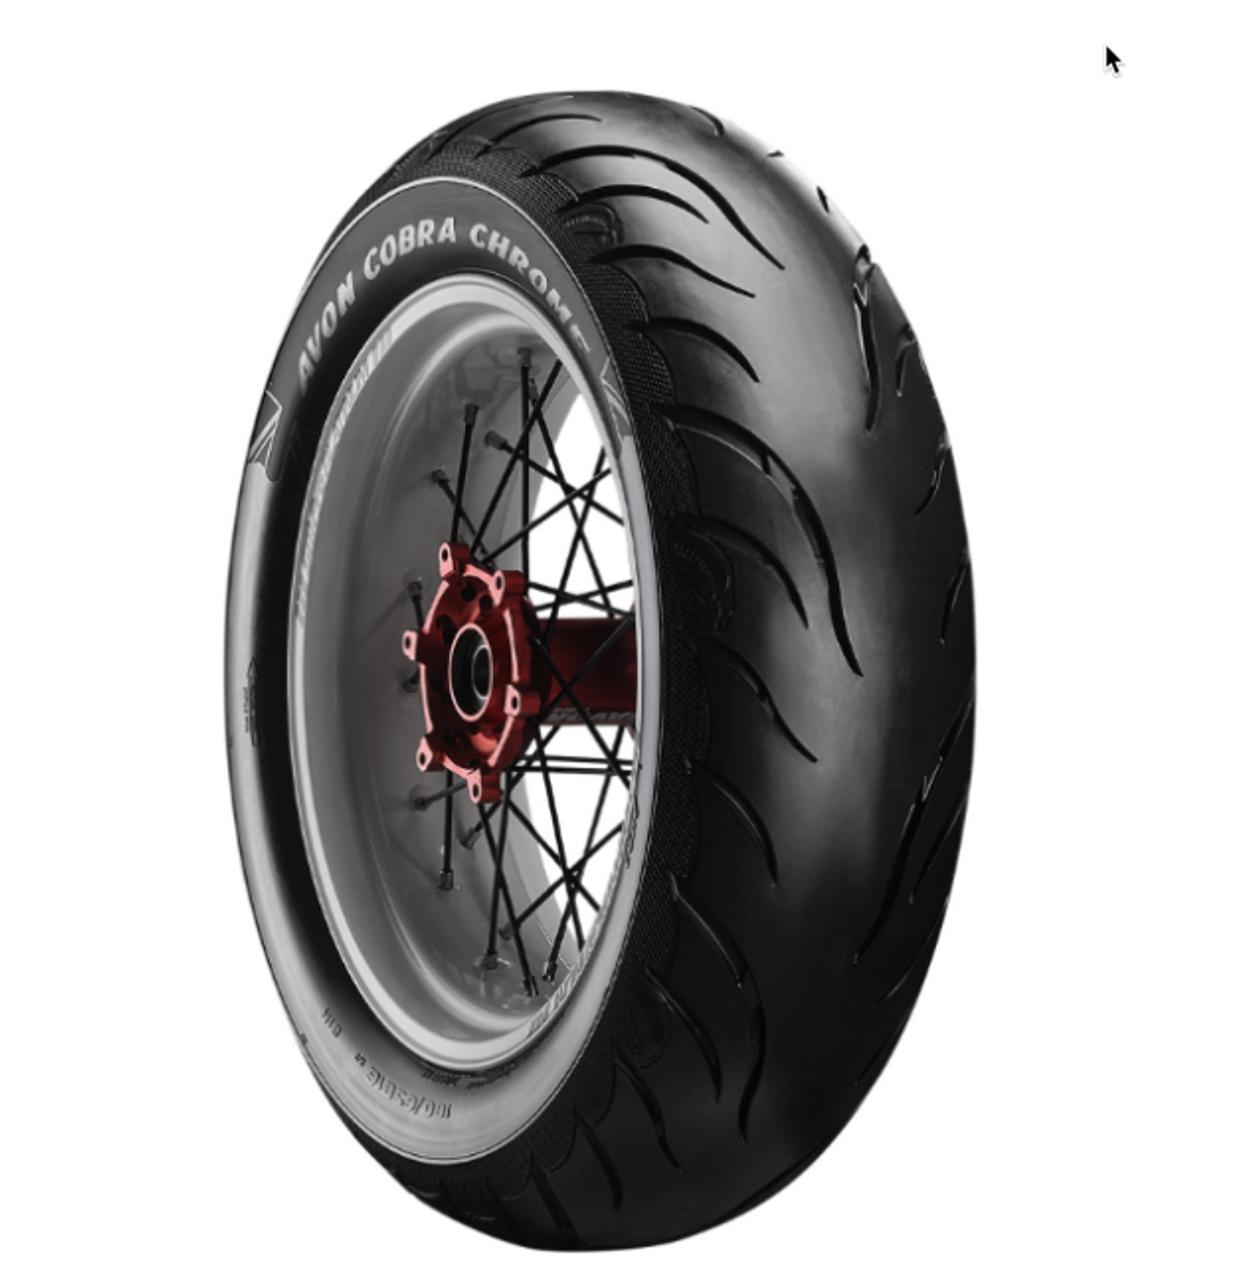 Avon Cobra Chrome Tire — Rear (Triumph Rocket 3 2020) (LGA-0302-1265)